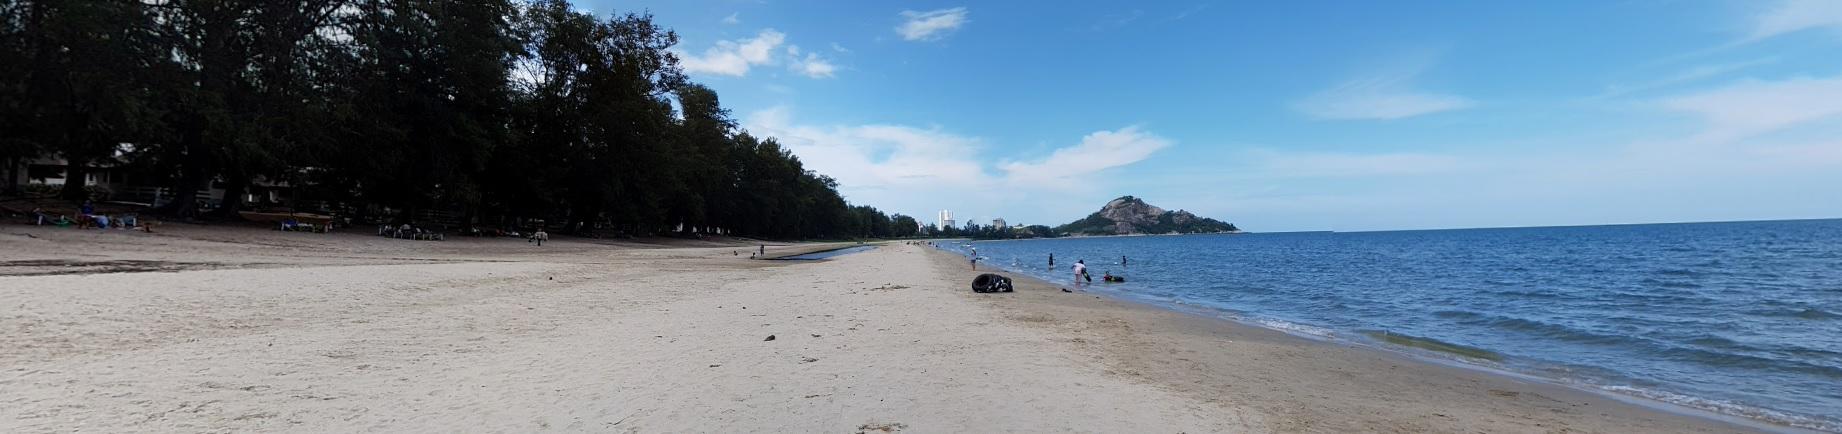 Suanson Pradipat Beach Huahin หาดสวนสนประดิพันธ์ หัวหิน